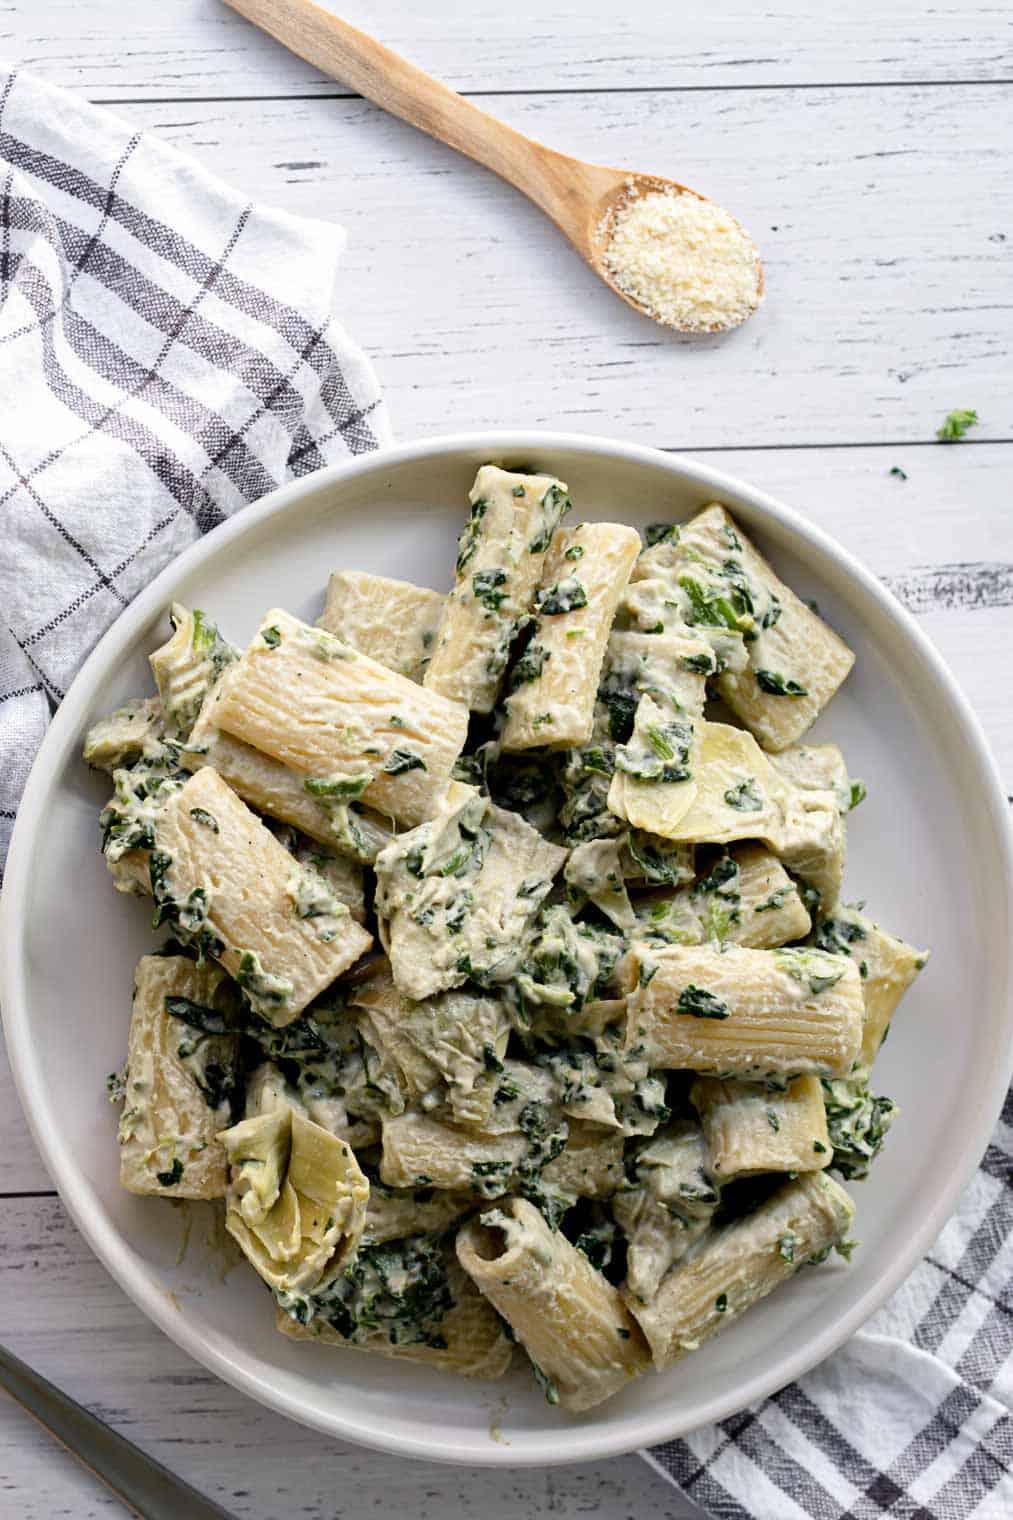 Plate of vegan spinach artichoke creamy pasta.